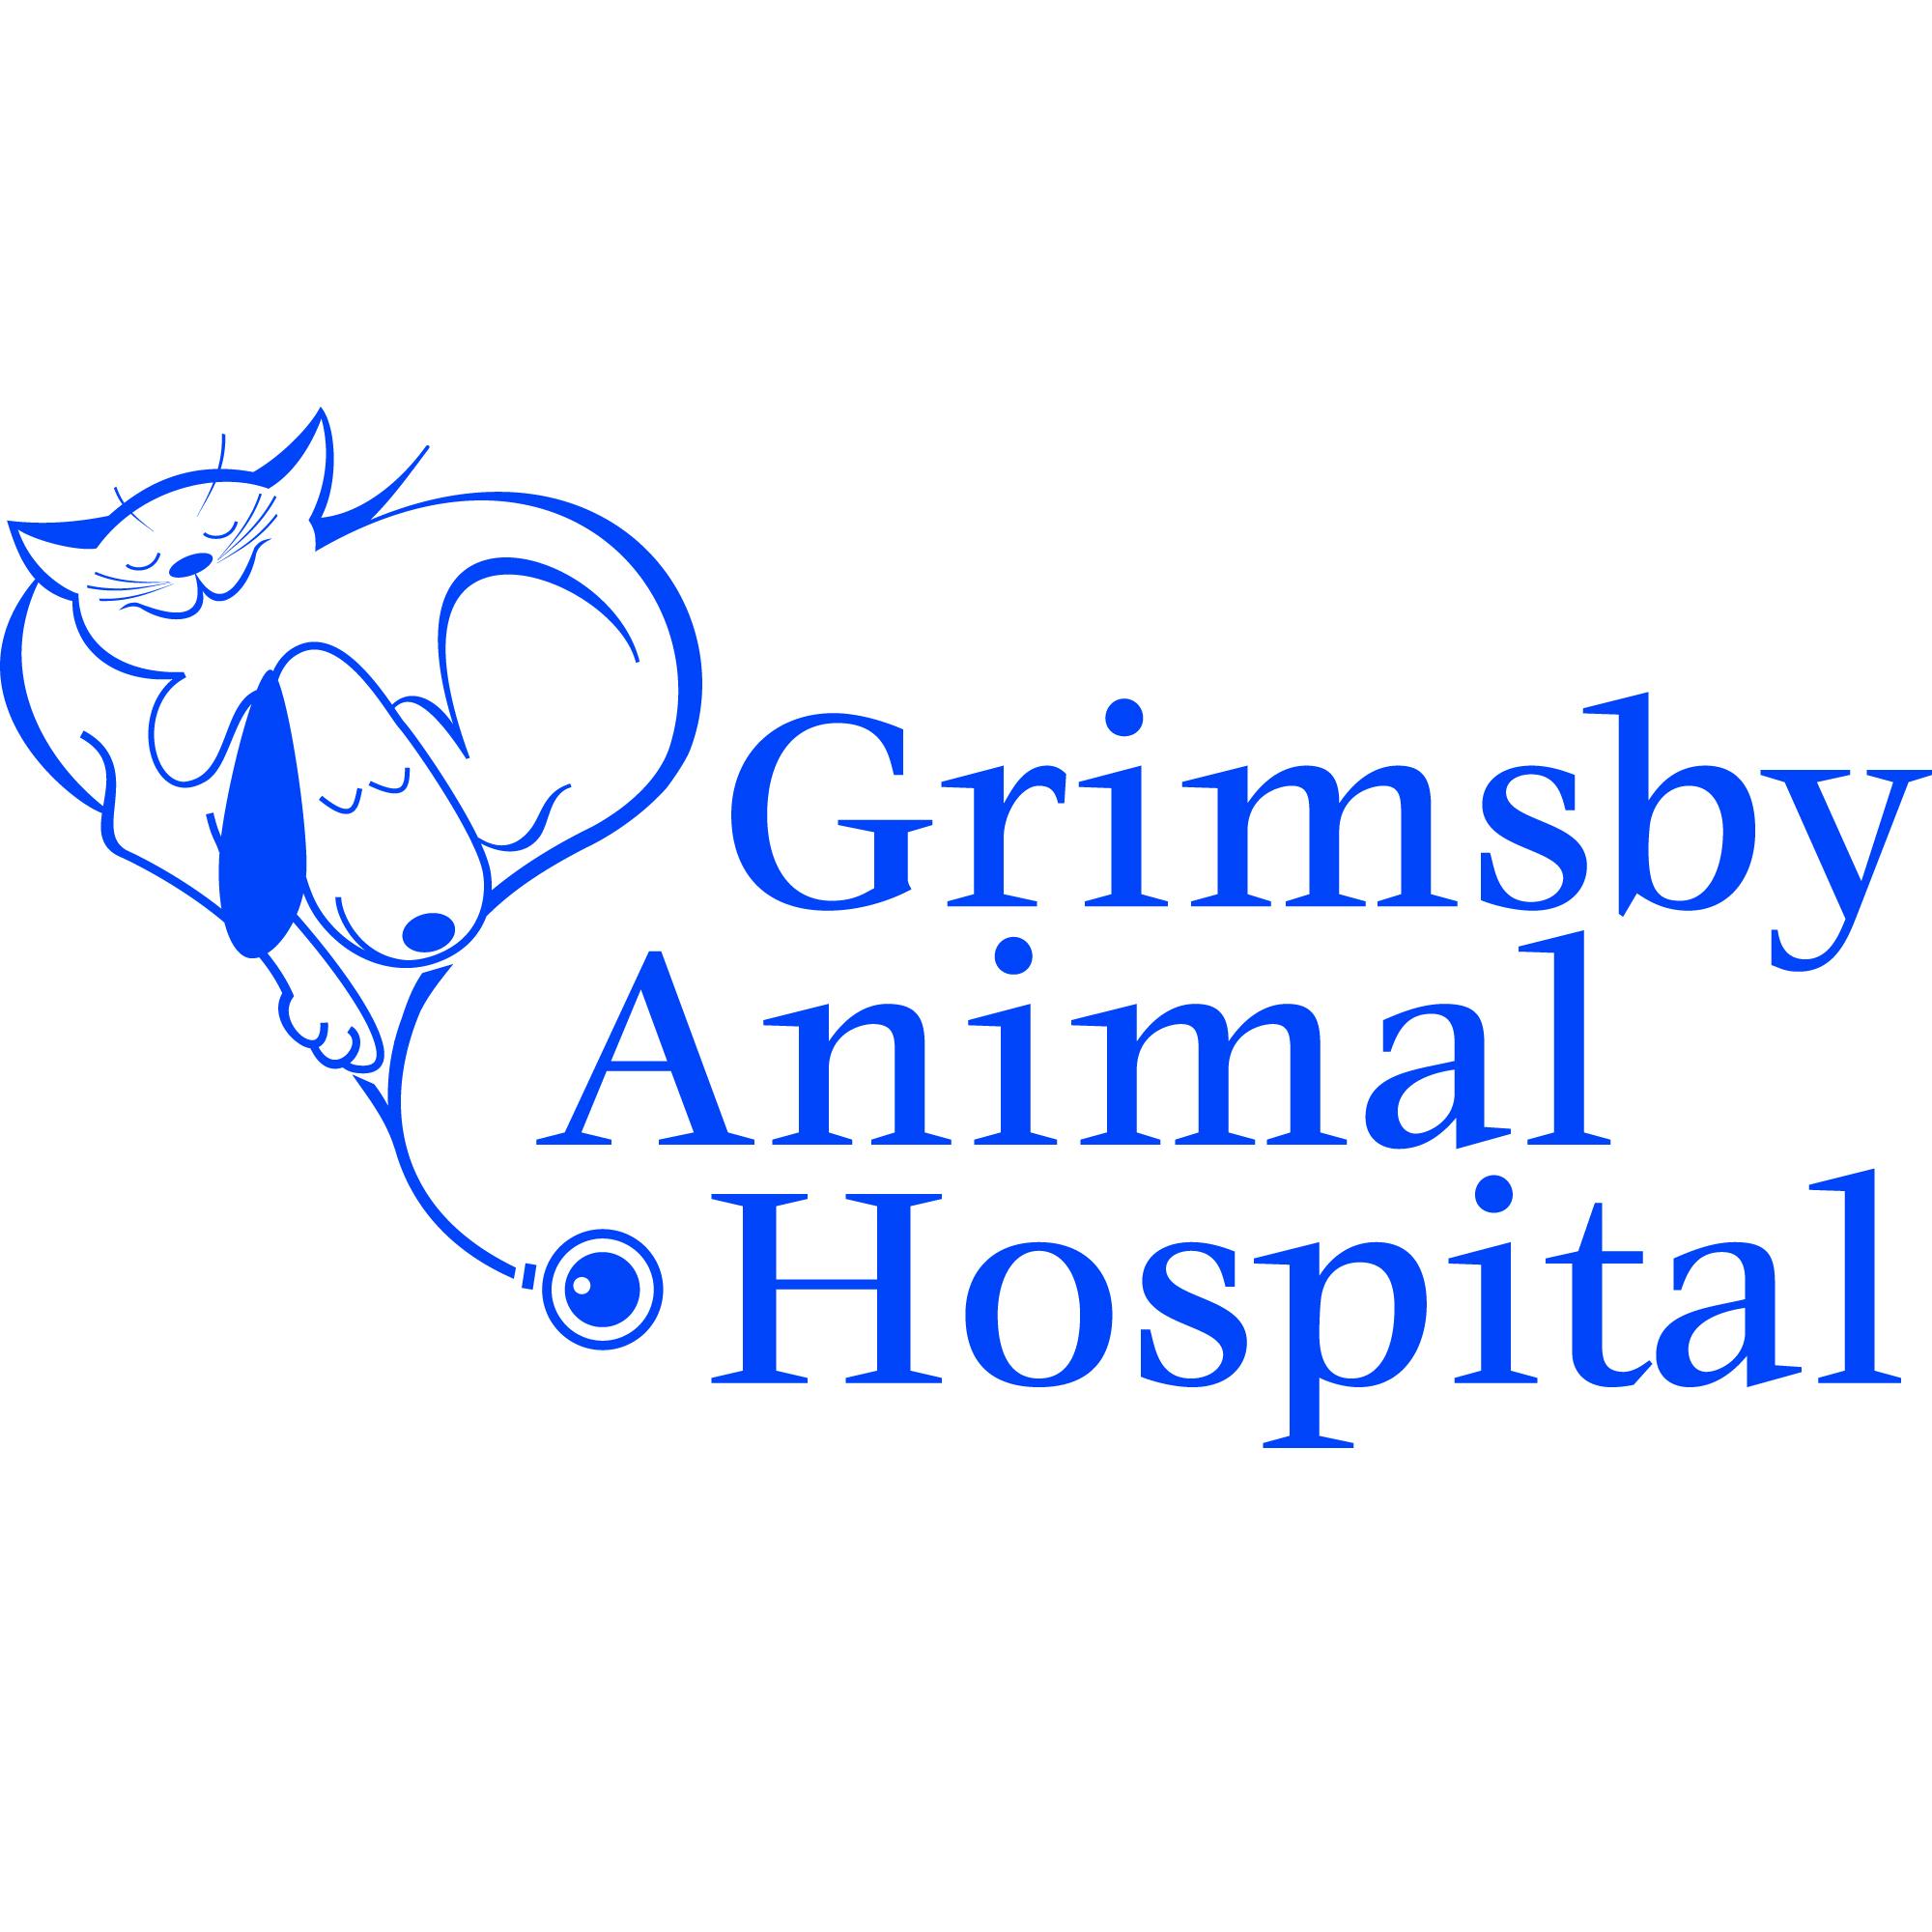 Grimsby Animal Hospital